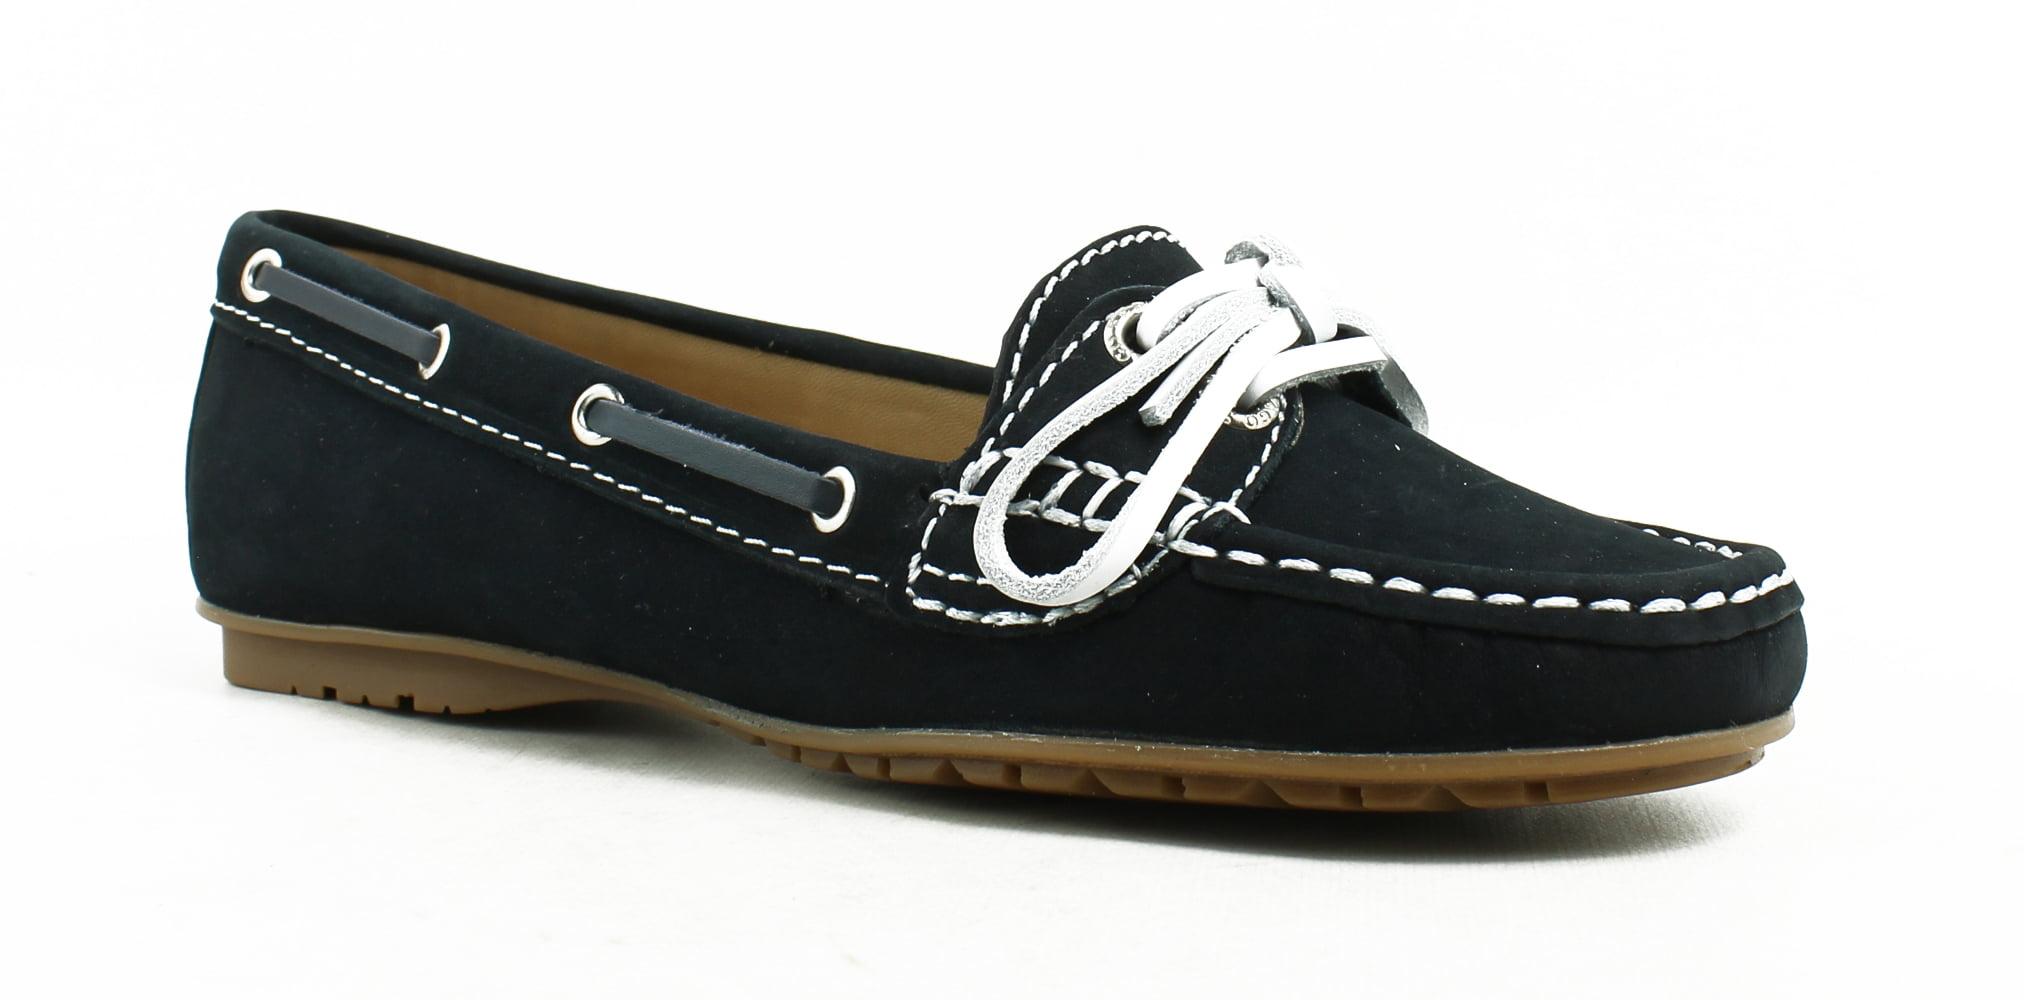 New Sebago Womens Blue Boat Shoes Size 5 by Sebago